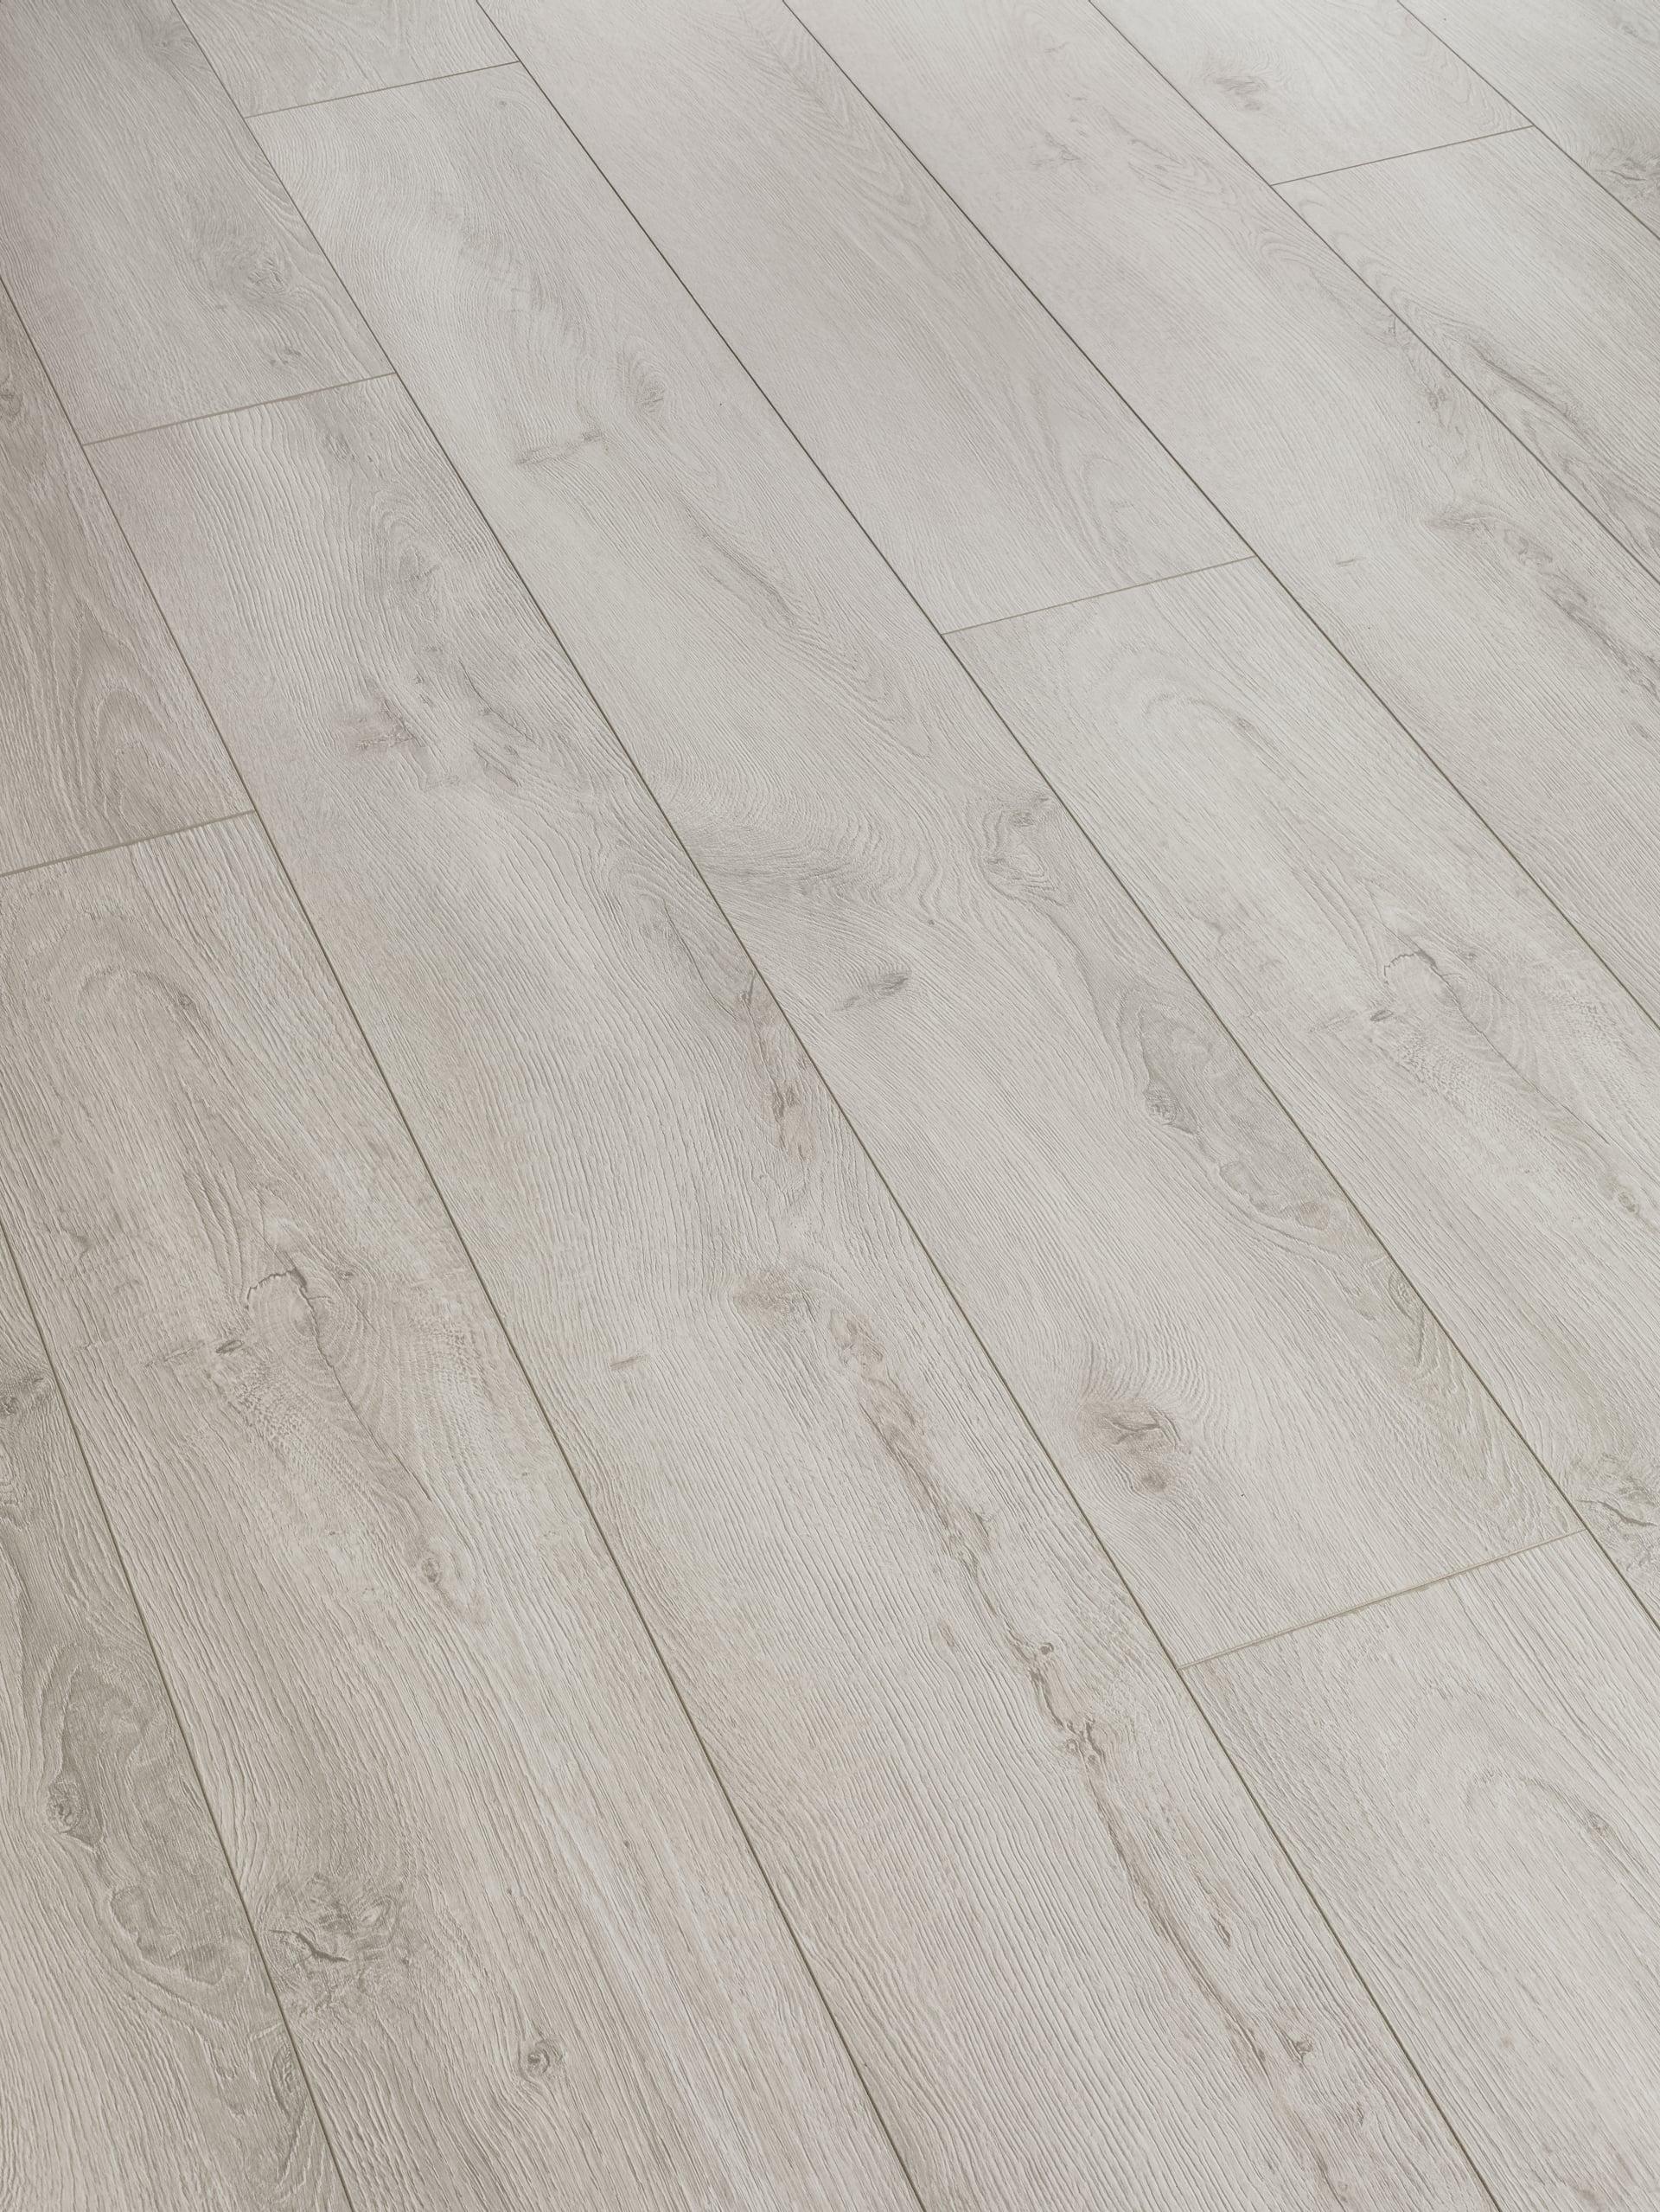 Swiss Krono Solid Oak 12 Mm Laminate, Toscana Laminate Flooring